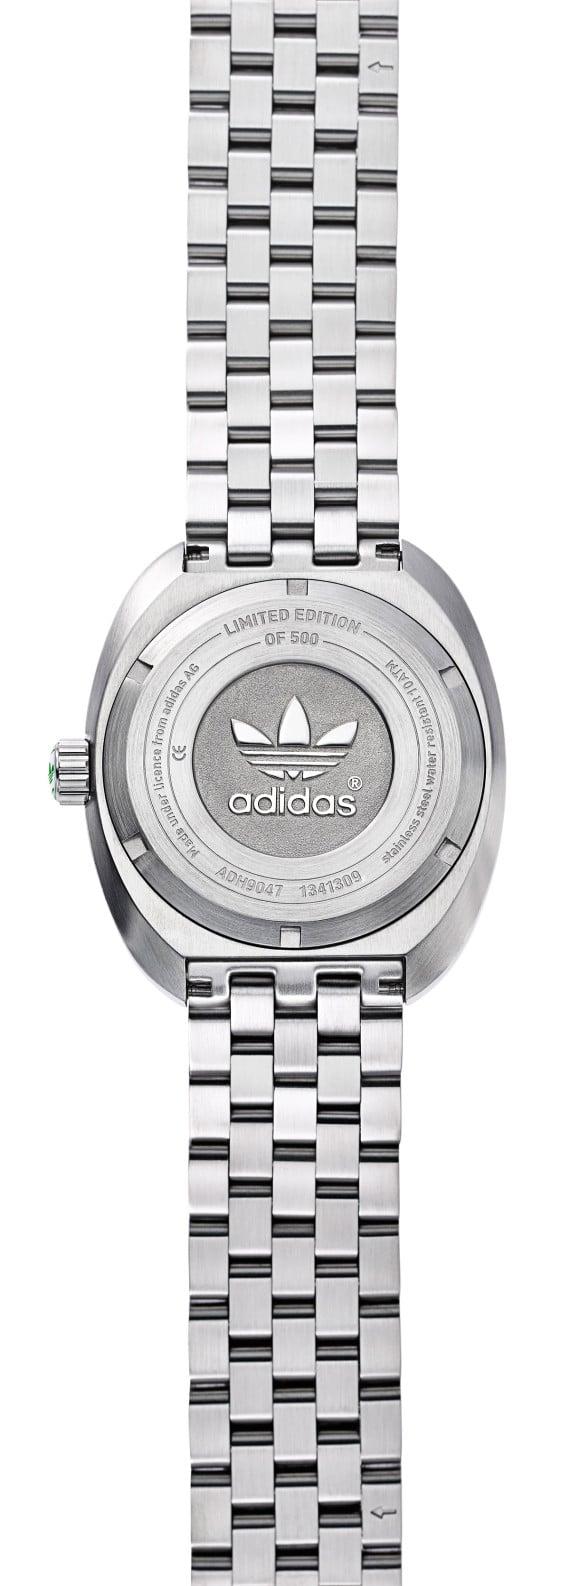 adidas Originals Stan Smith Watch